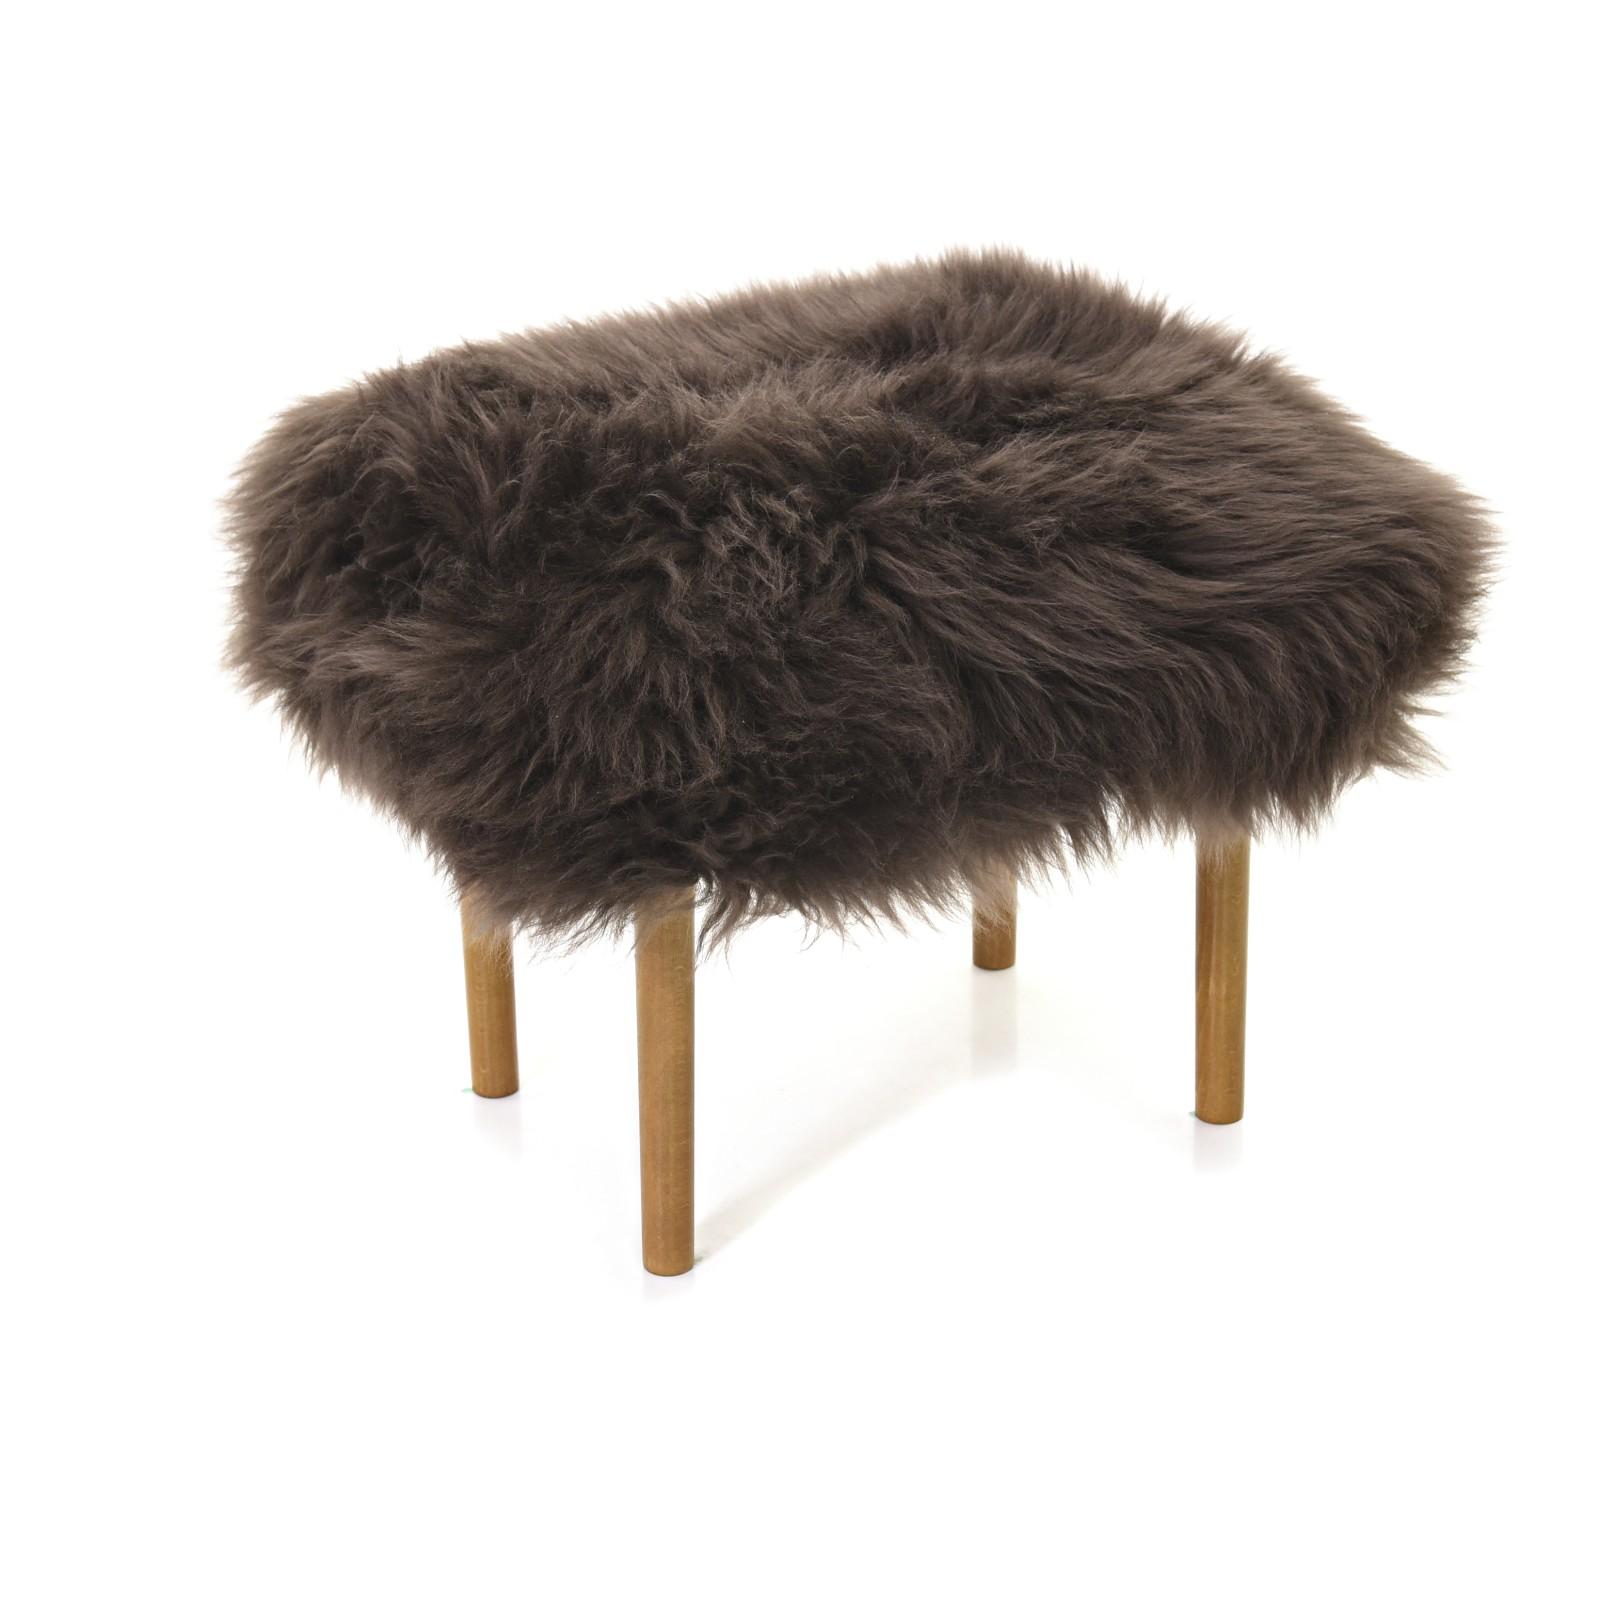 Ceri Sheepskin Footstool Mink